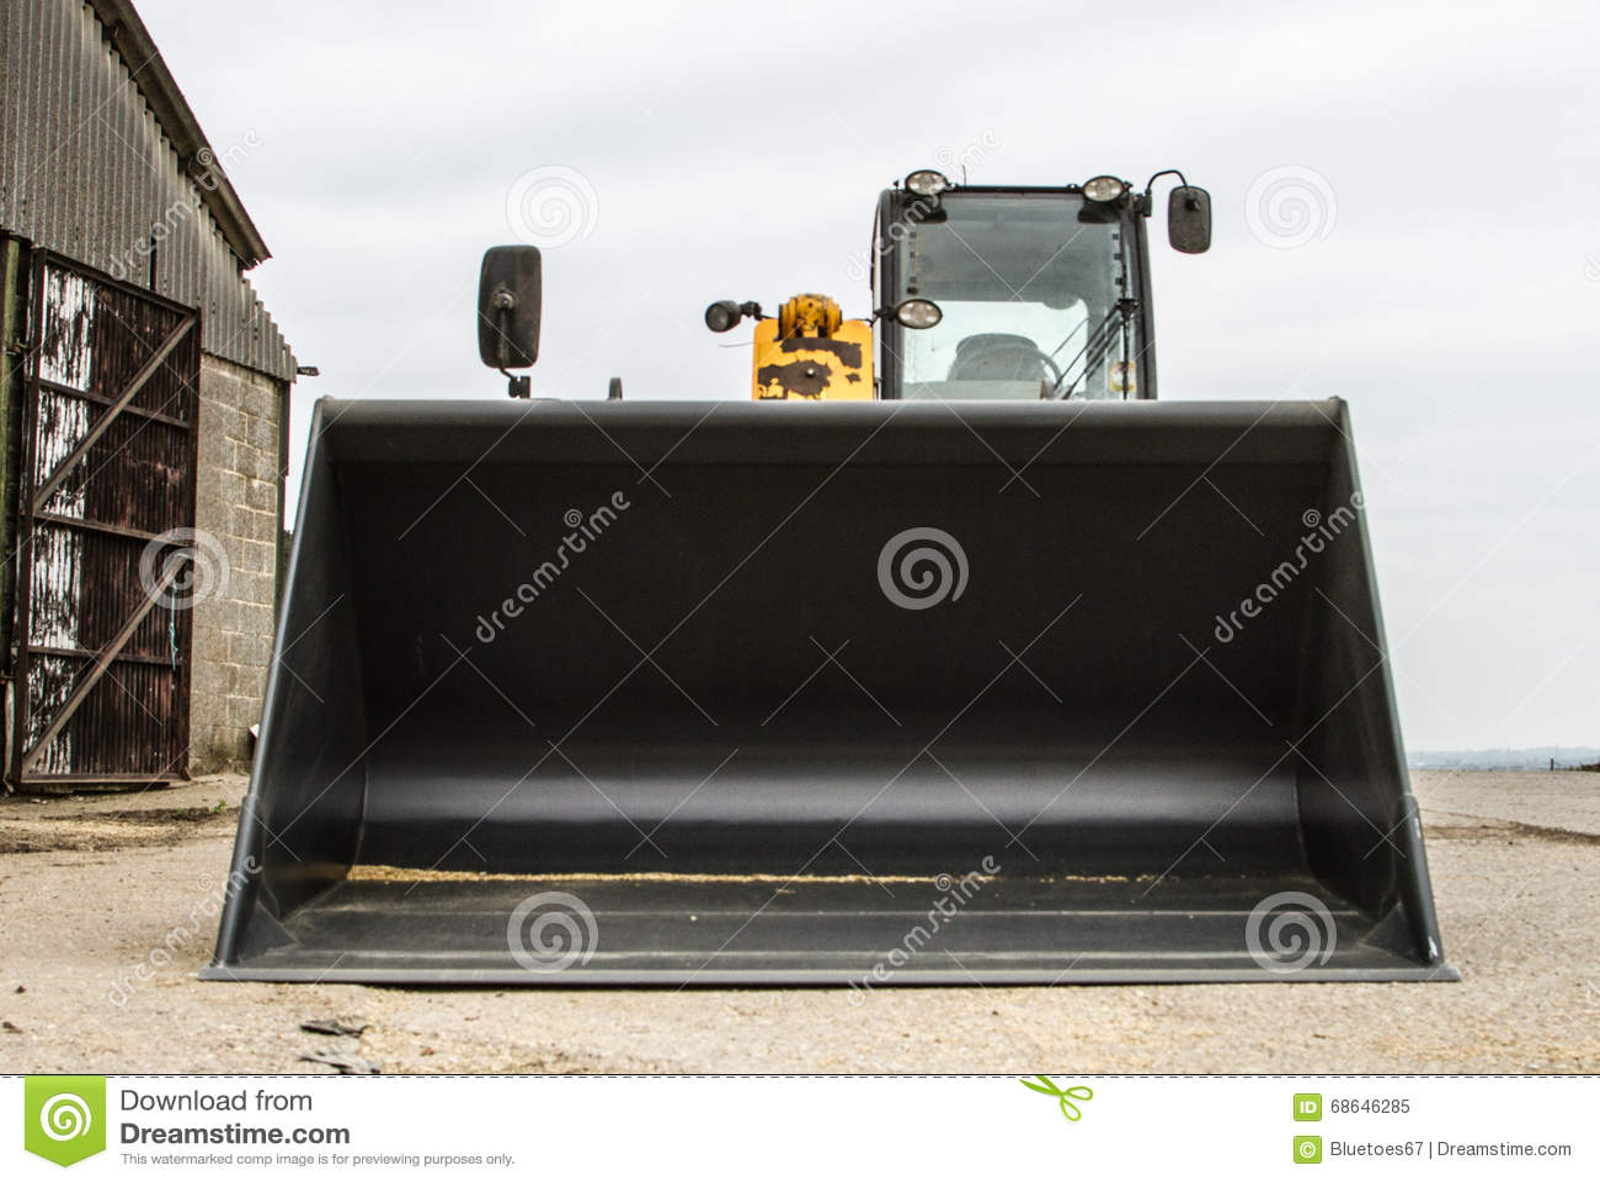 construction digger loader front bucket editorial image image